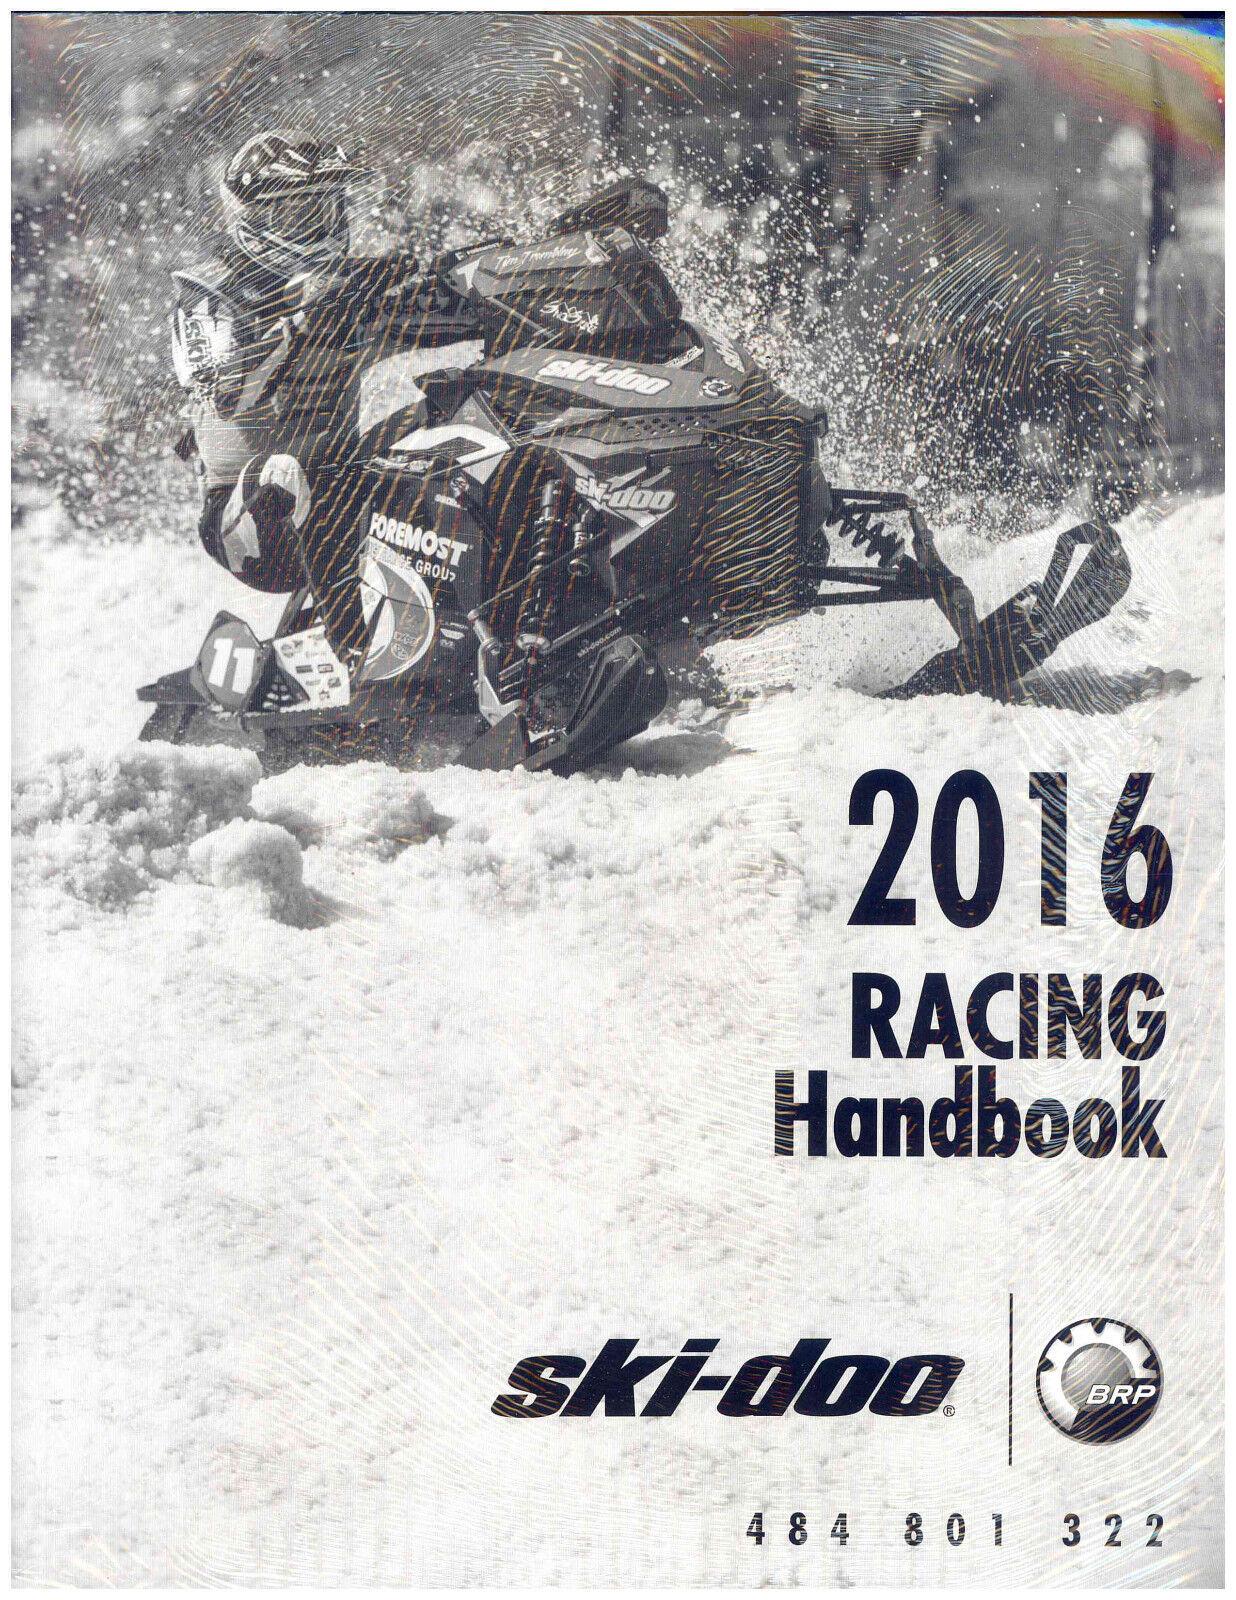 2016  SKI-DOO RACING HANDBOOK 484801322  discount